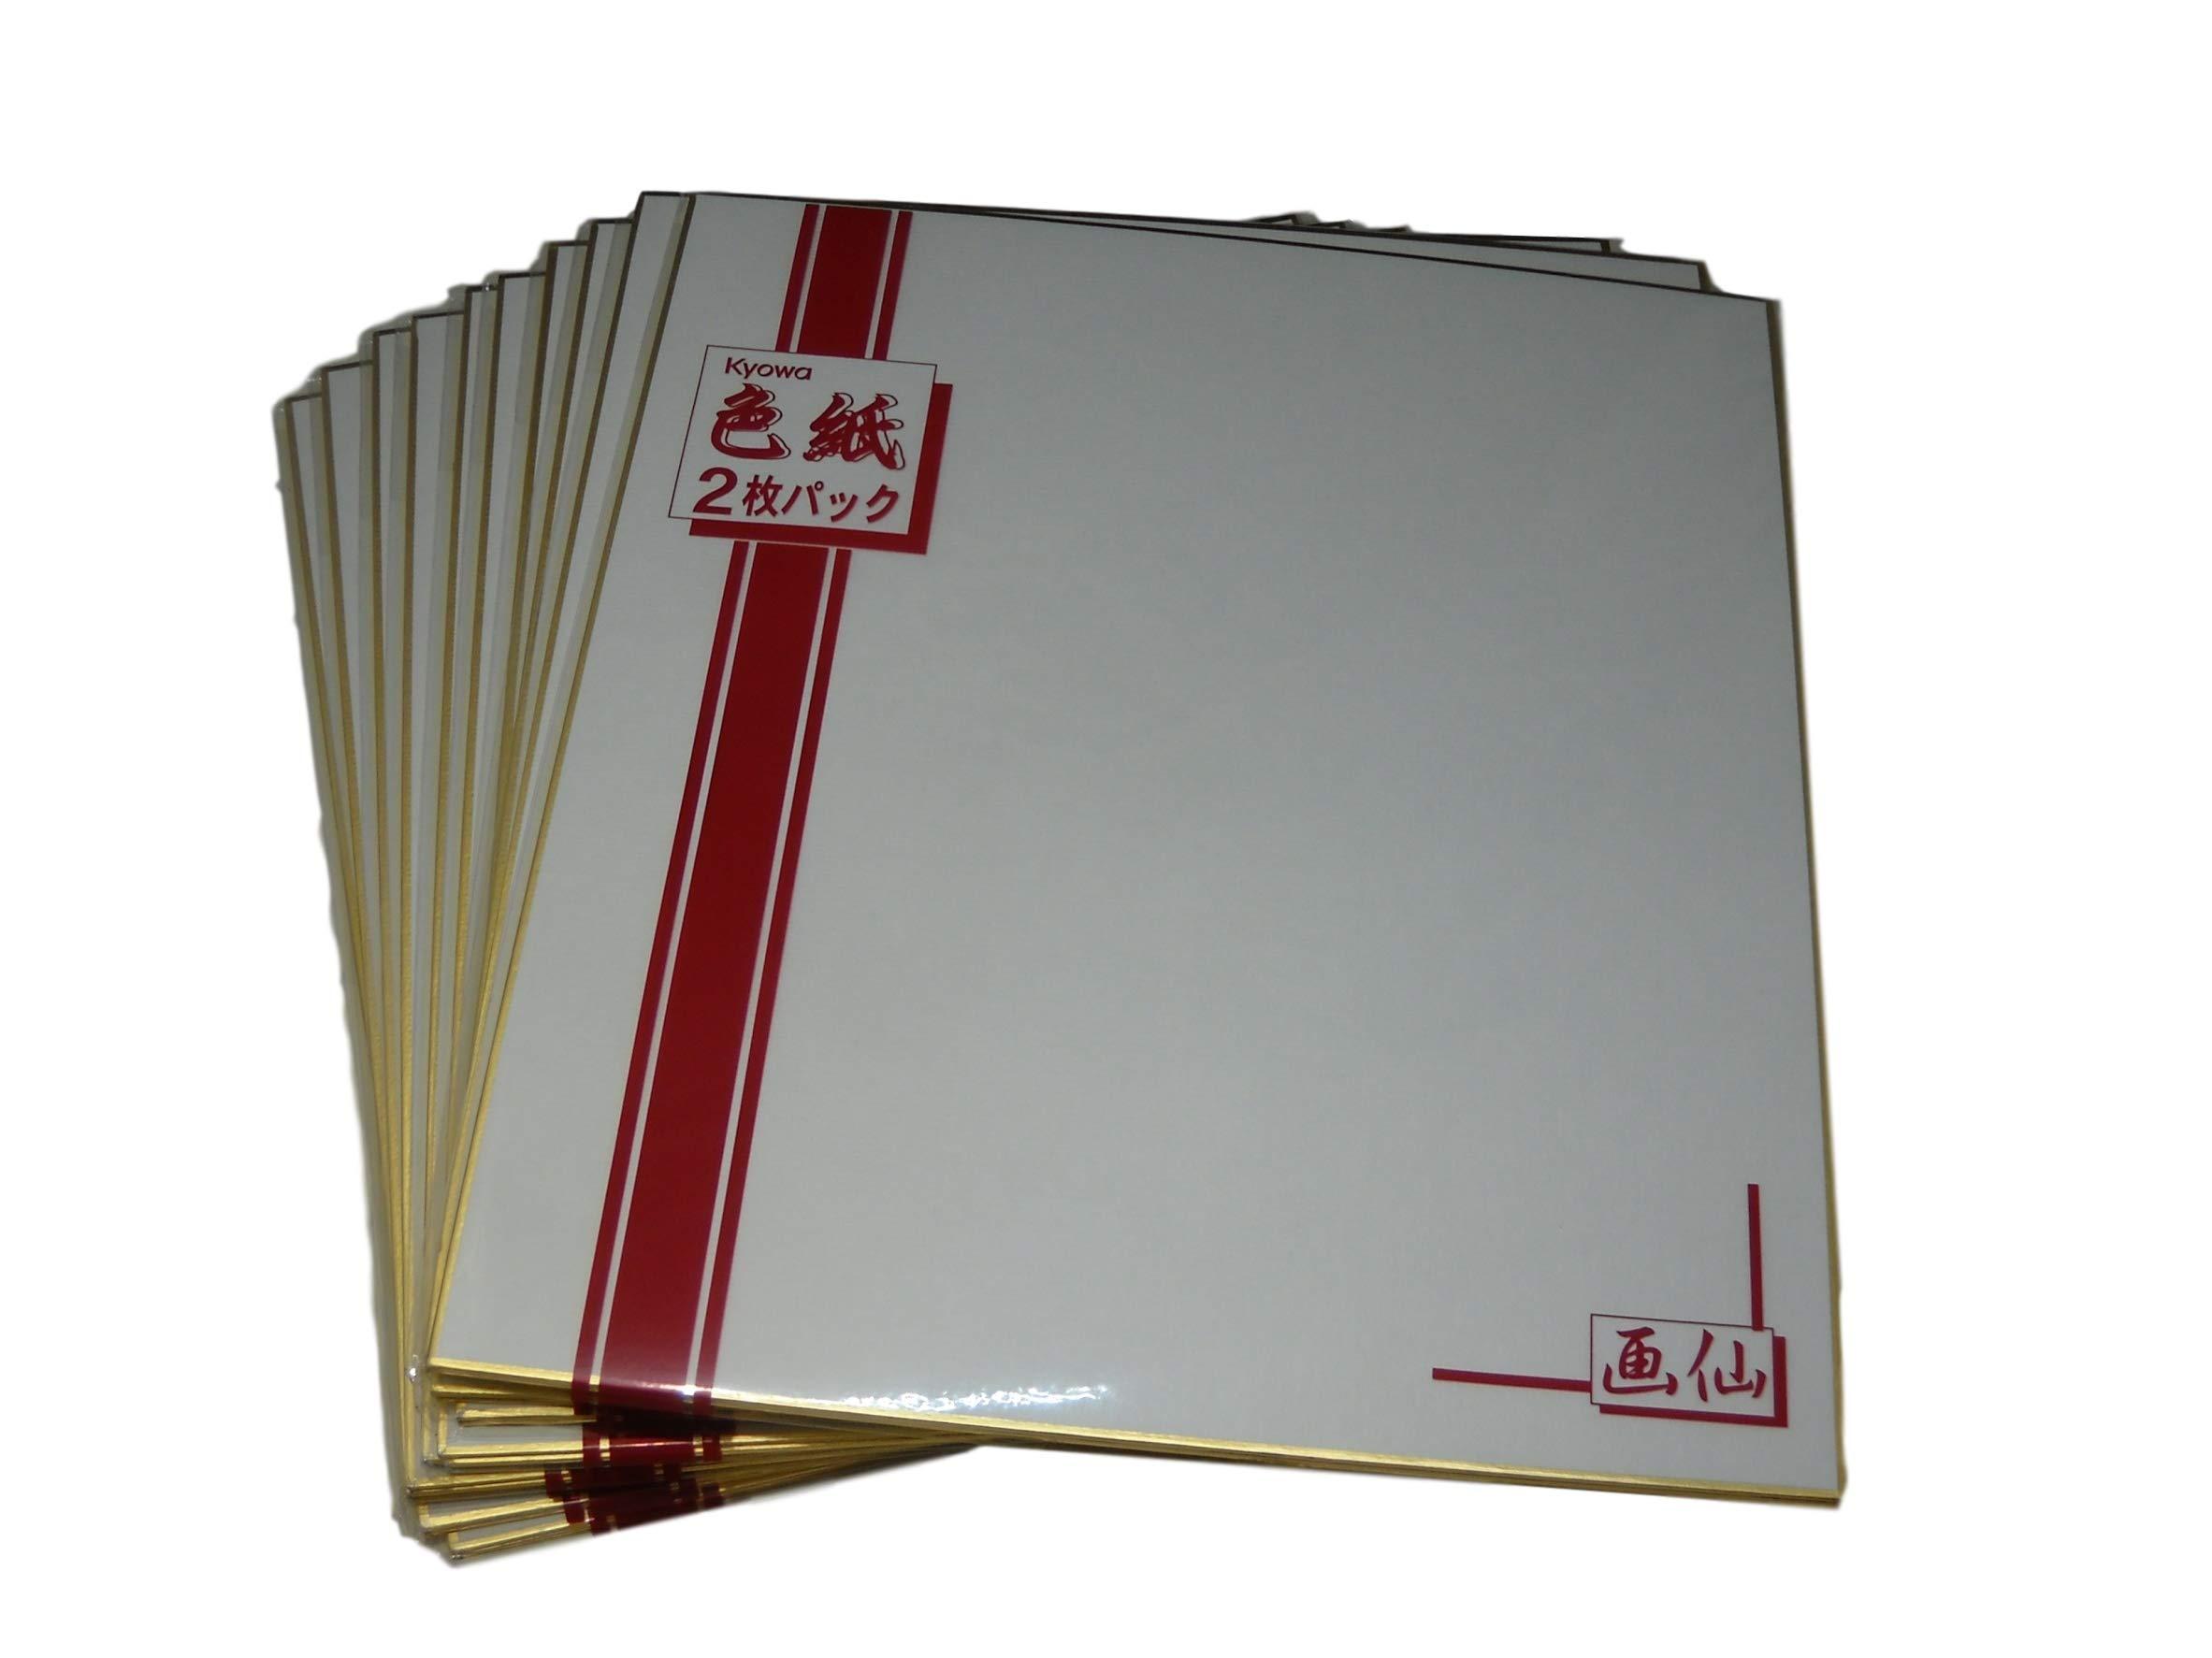 10 x Japanese Kyowa Shikishi White Board Set of 2 9.5'' x 10.75'' Gold Bordered for Japanese Art or Calligraphy Total 20 pcs